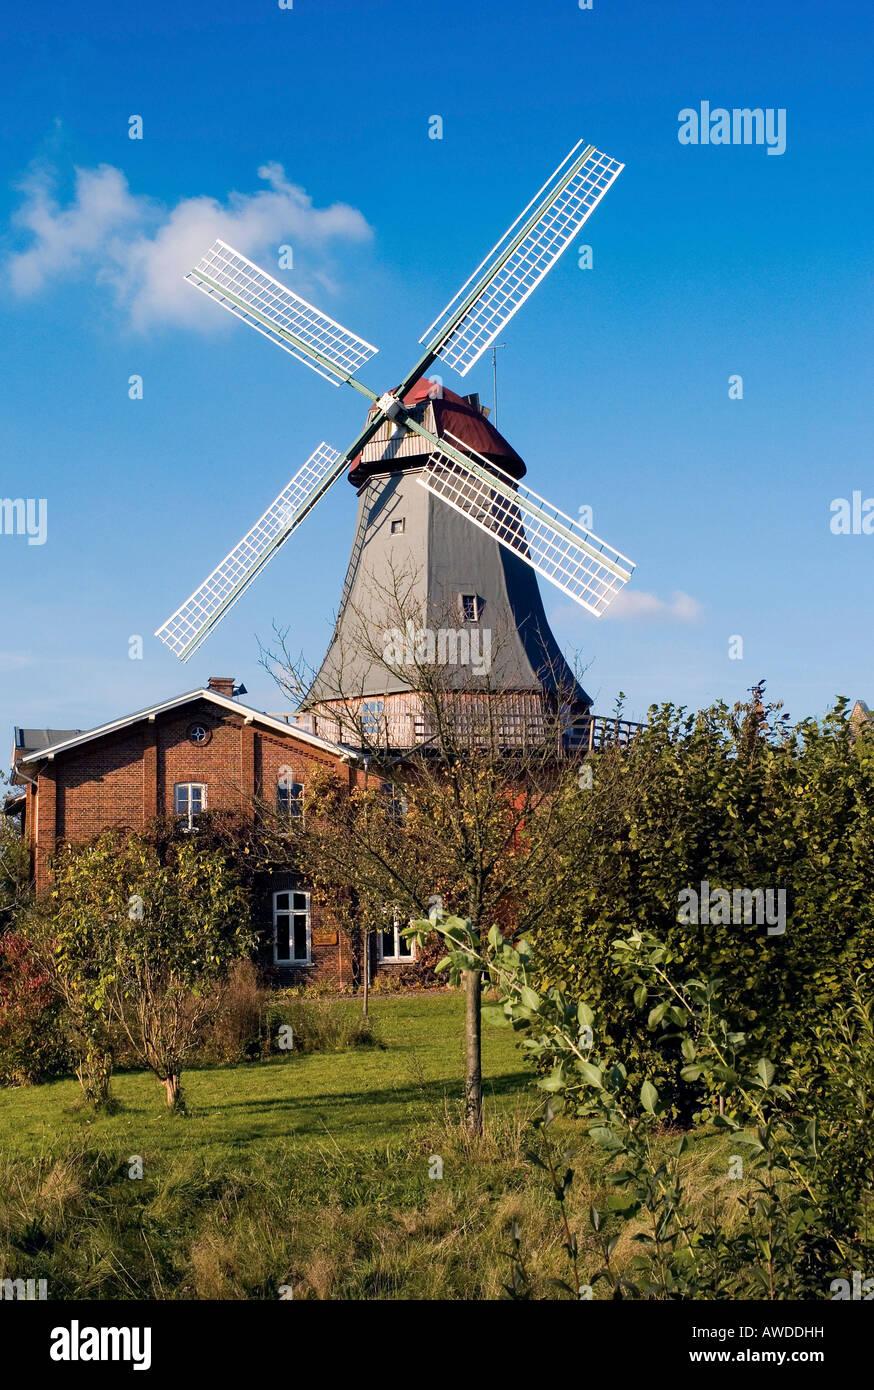 Windmill, Osterholz-Scharmbeck, Lower Saxony, Germany - Stock Image